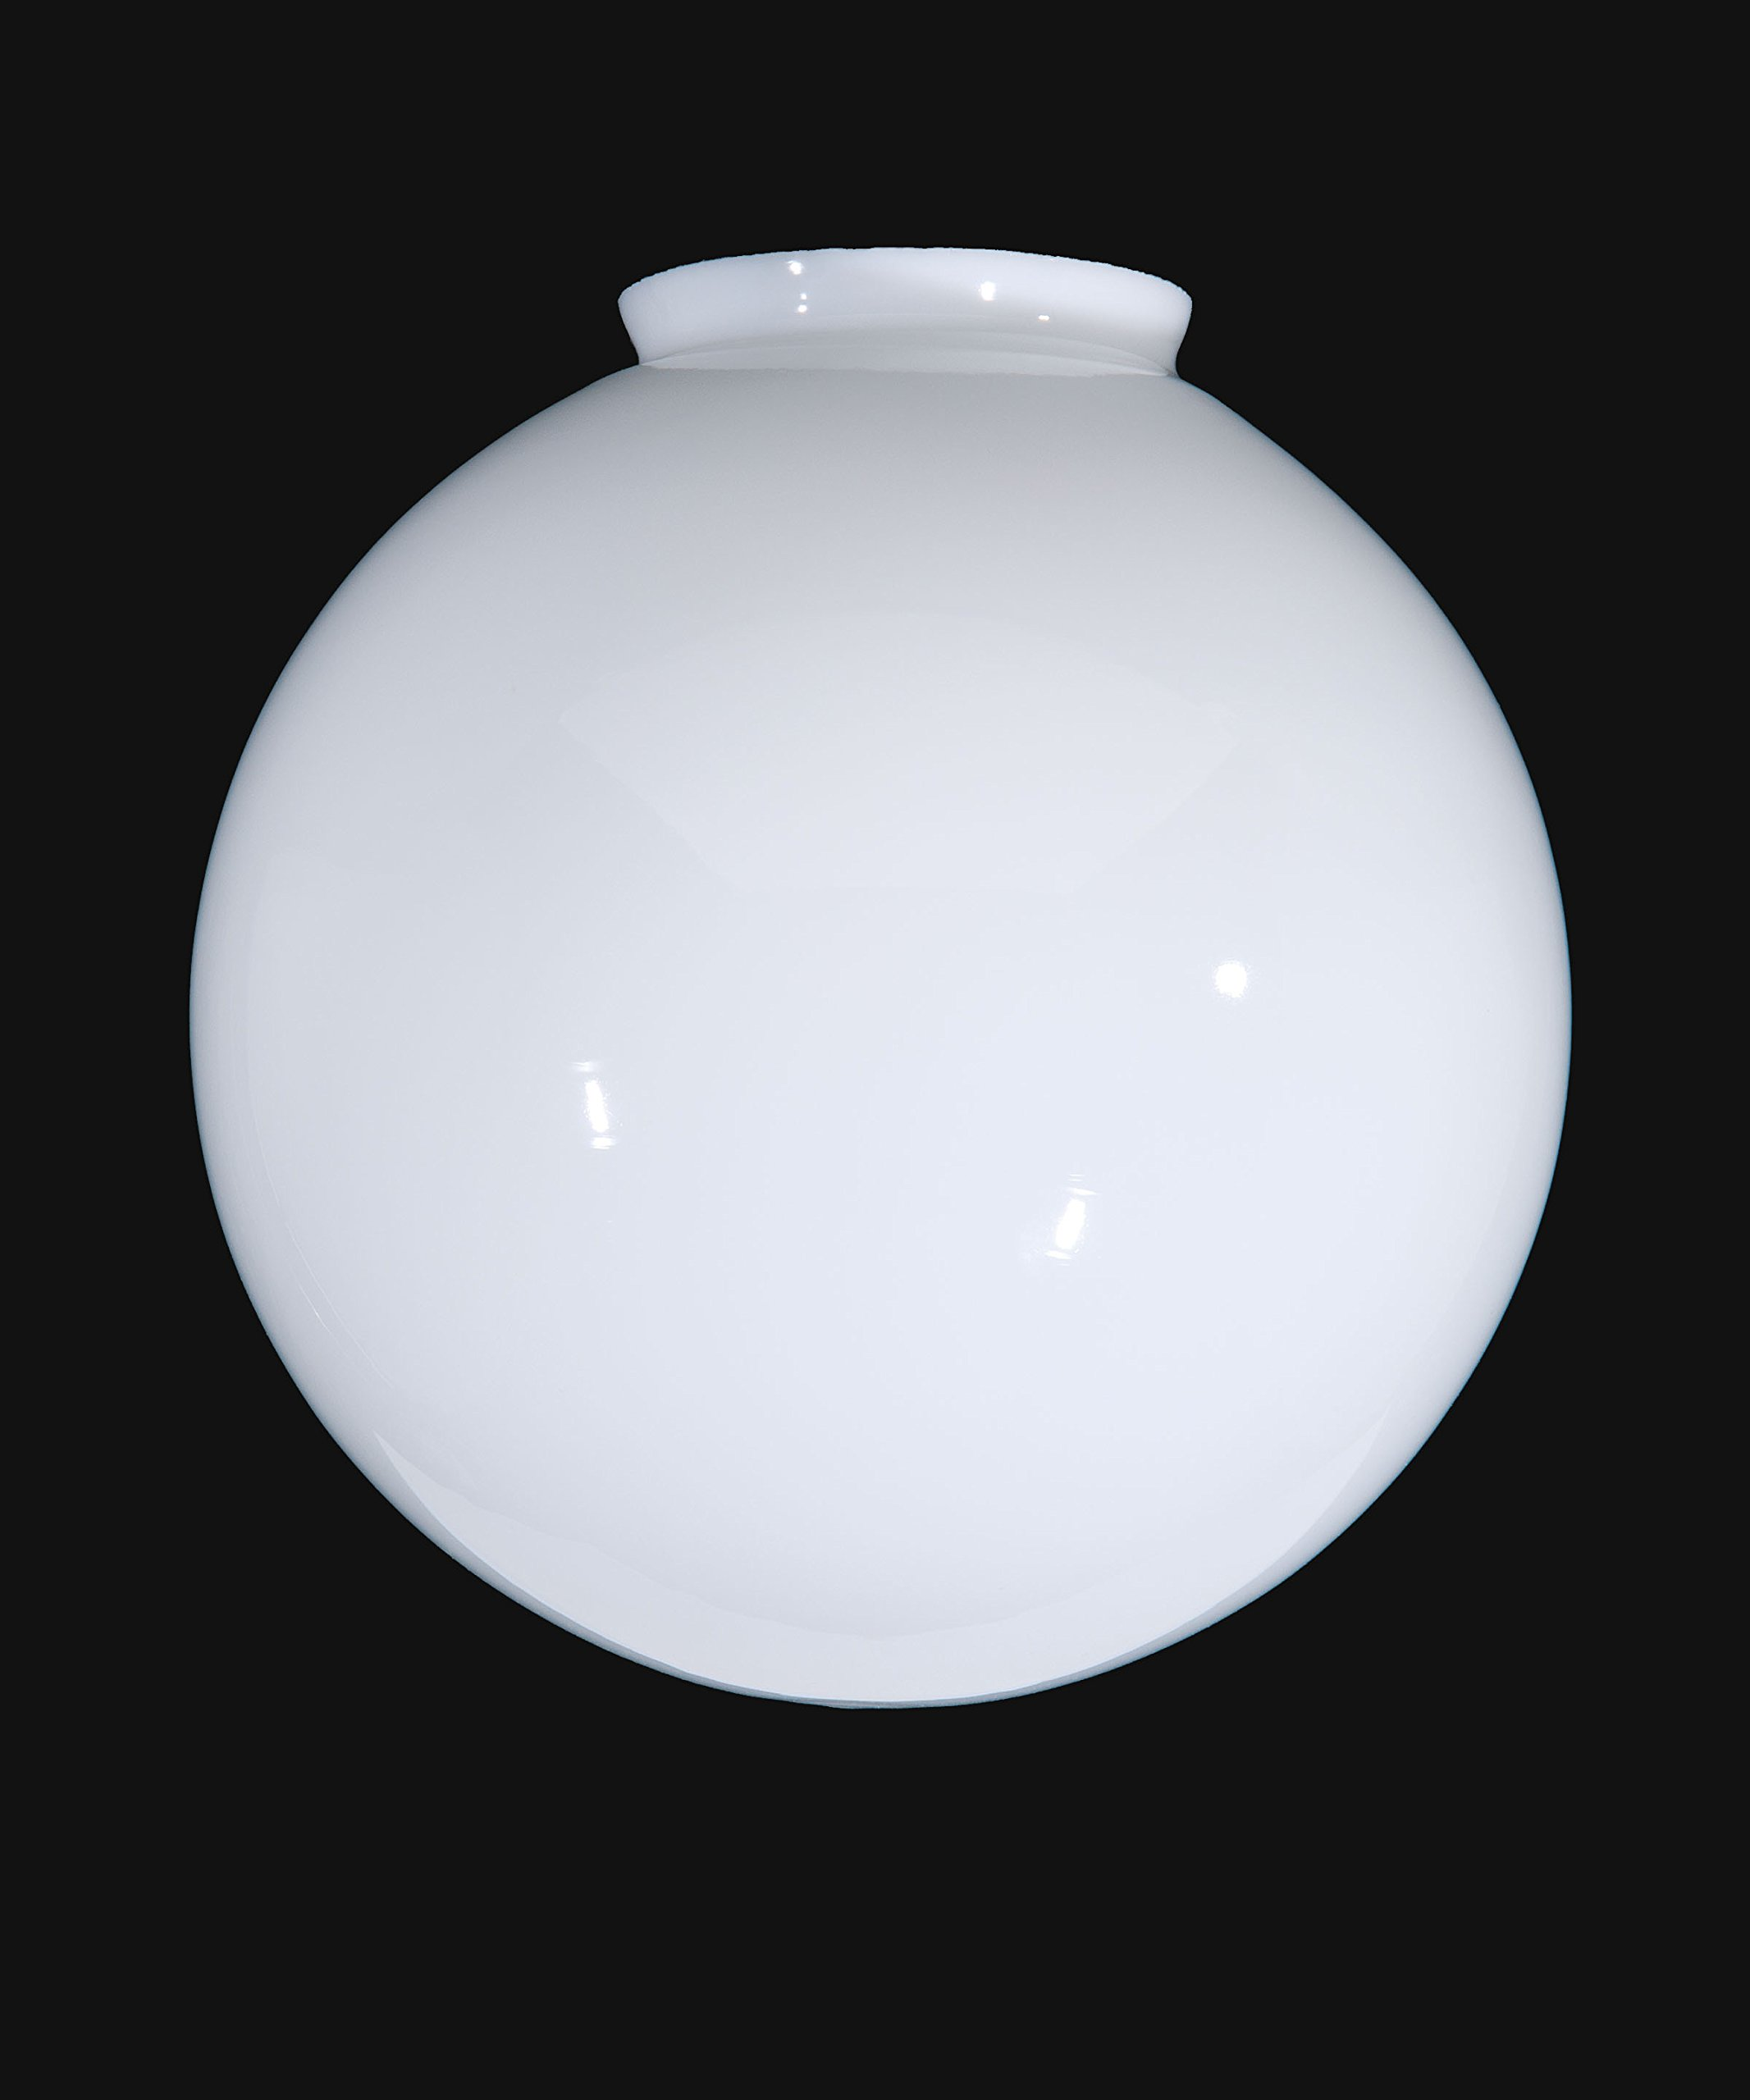 B&P Lamp 14'' Opal Glass Ball Lampshade by B&P Lamp